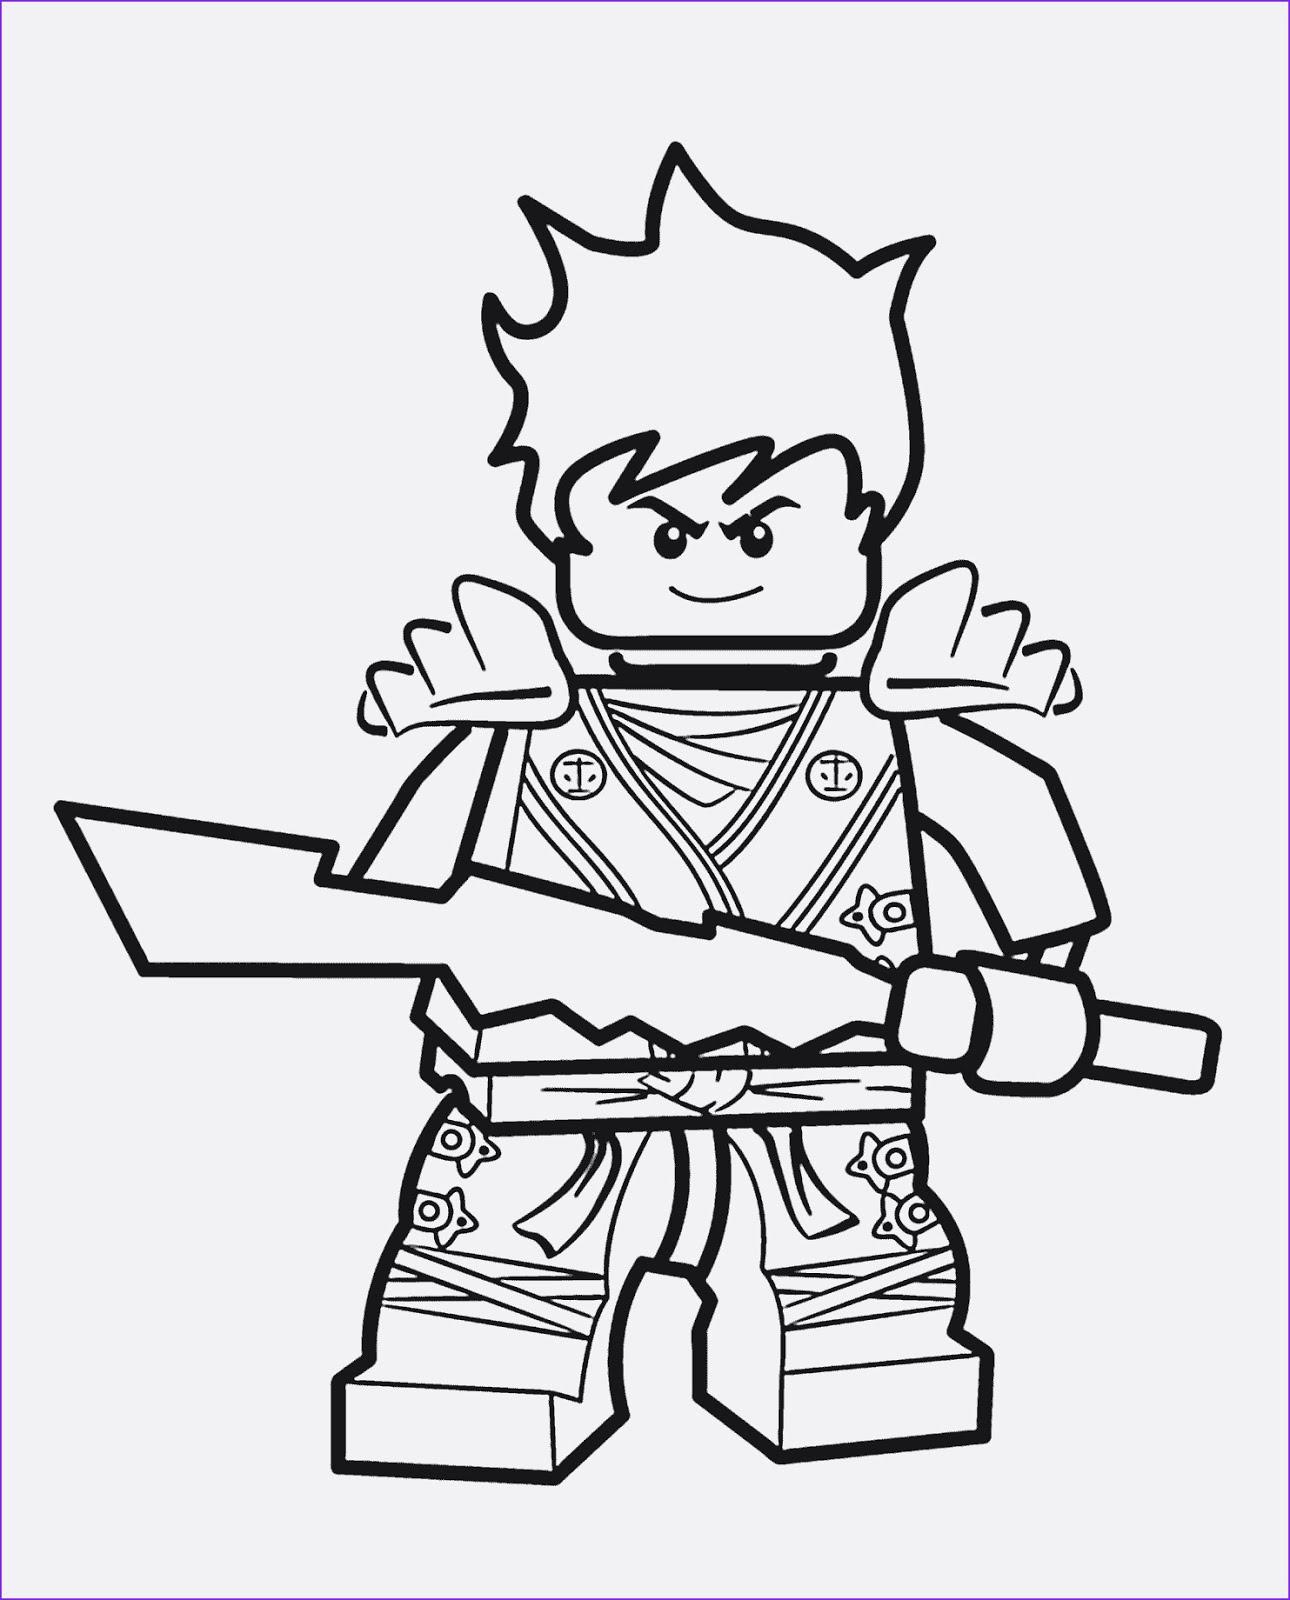 Ausmalbilder Lego Ninjago Lego